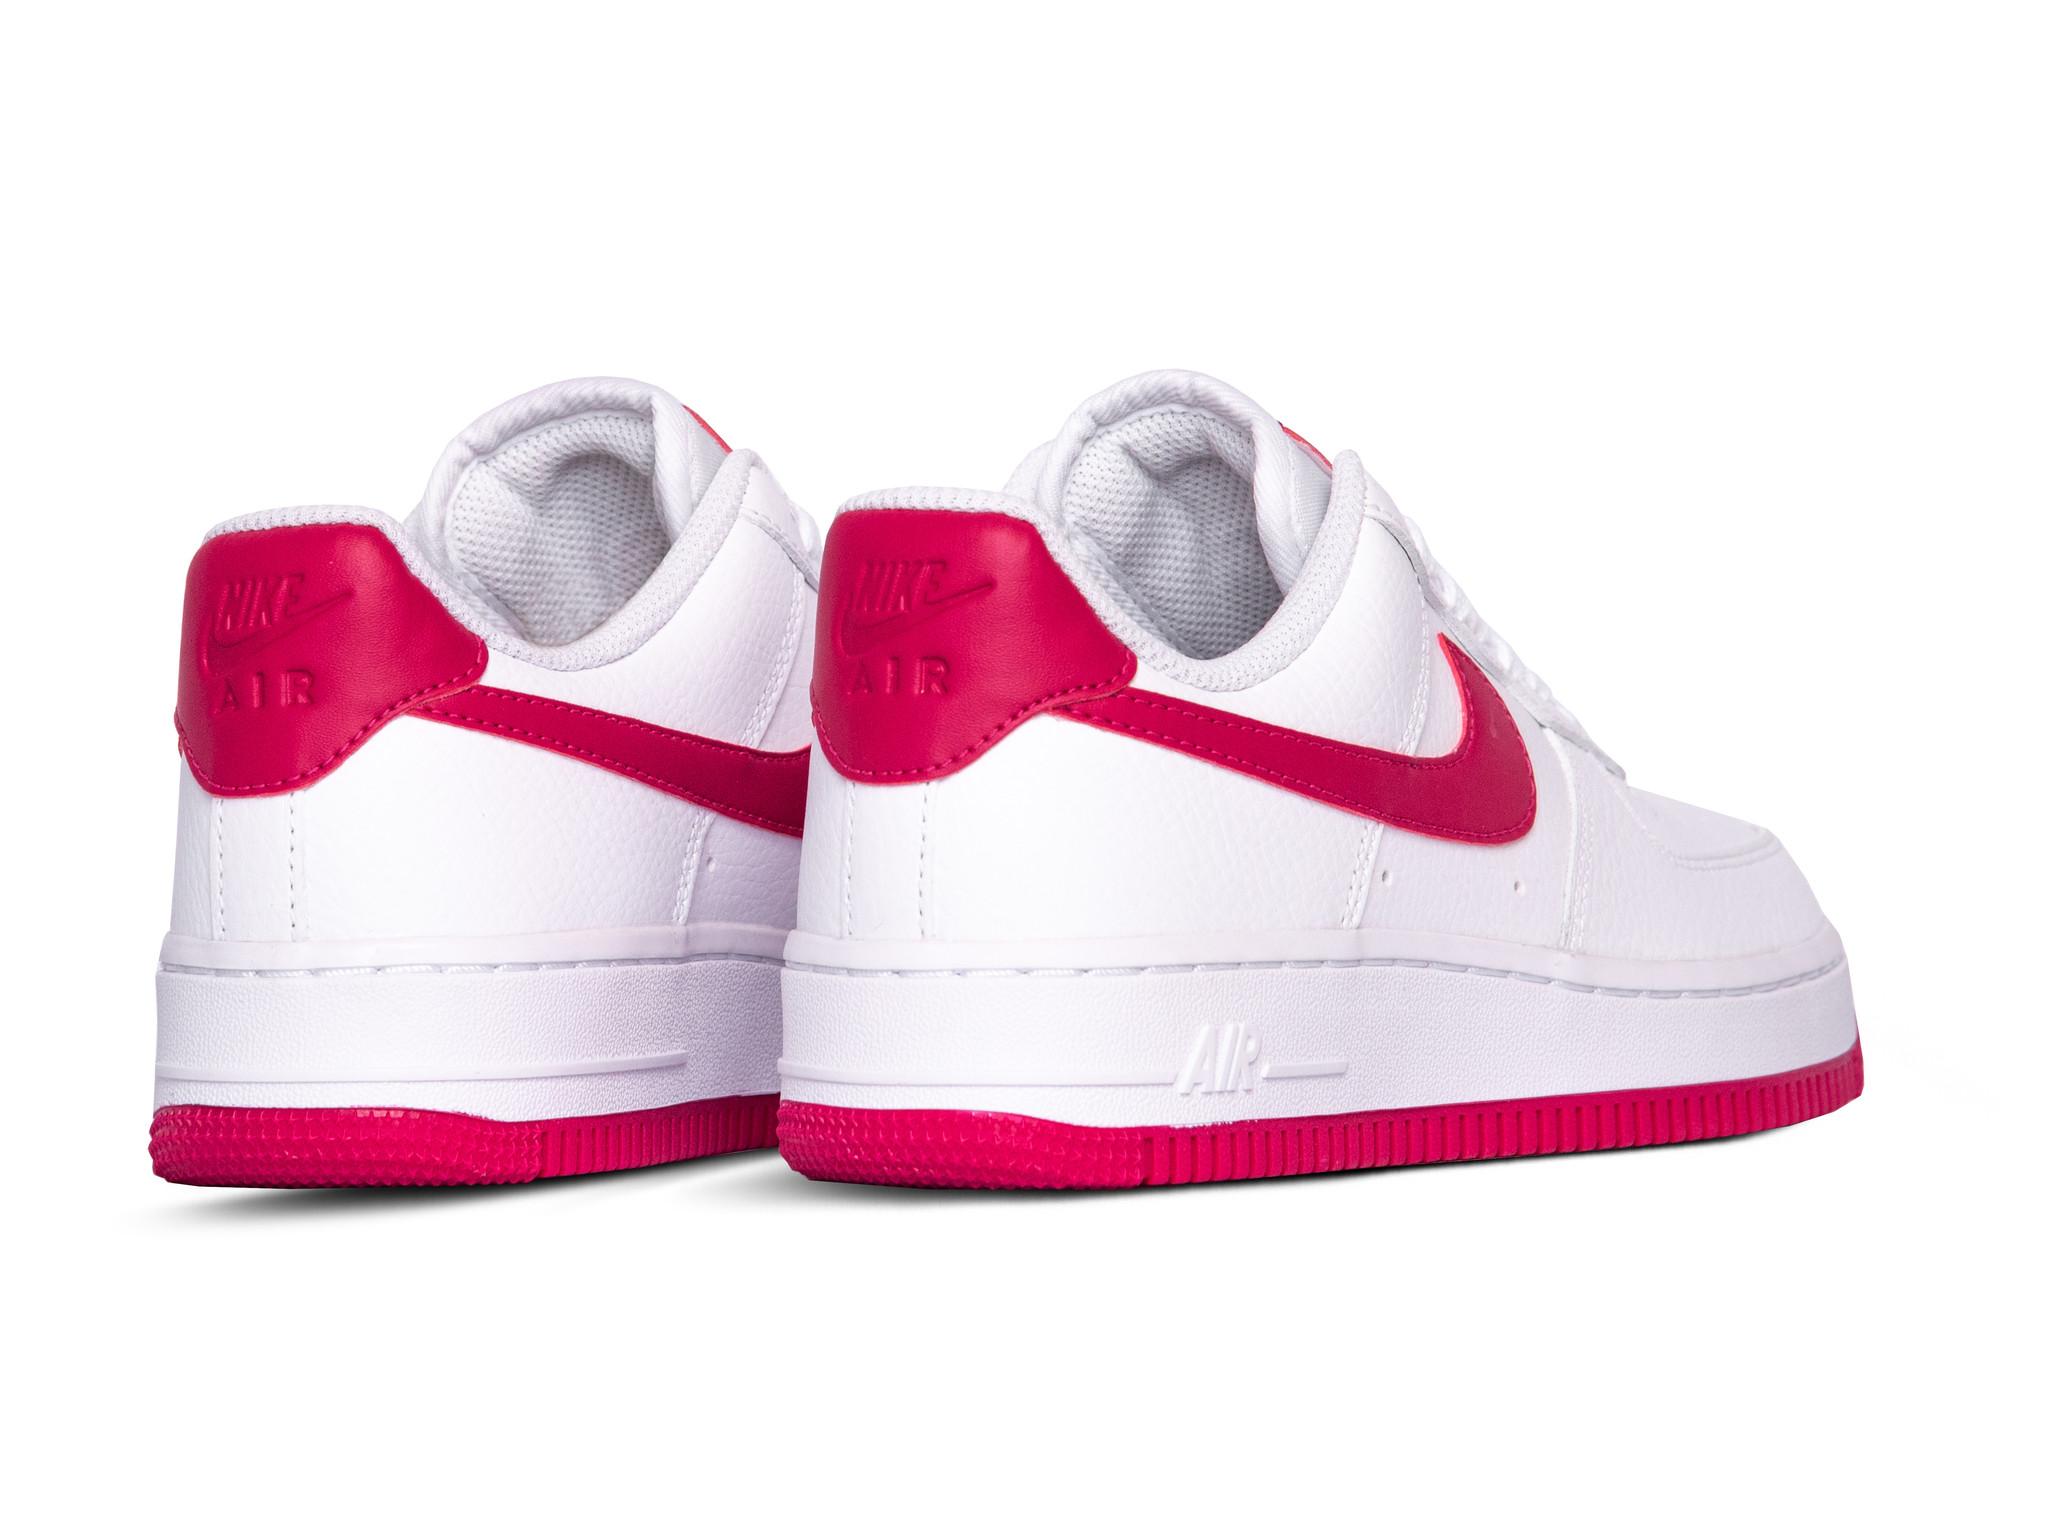 Nike Wmns Air Force 1 Sage Low pink white, 40.5